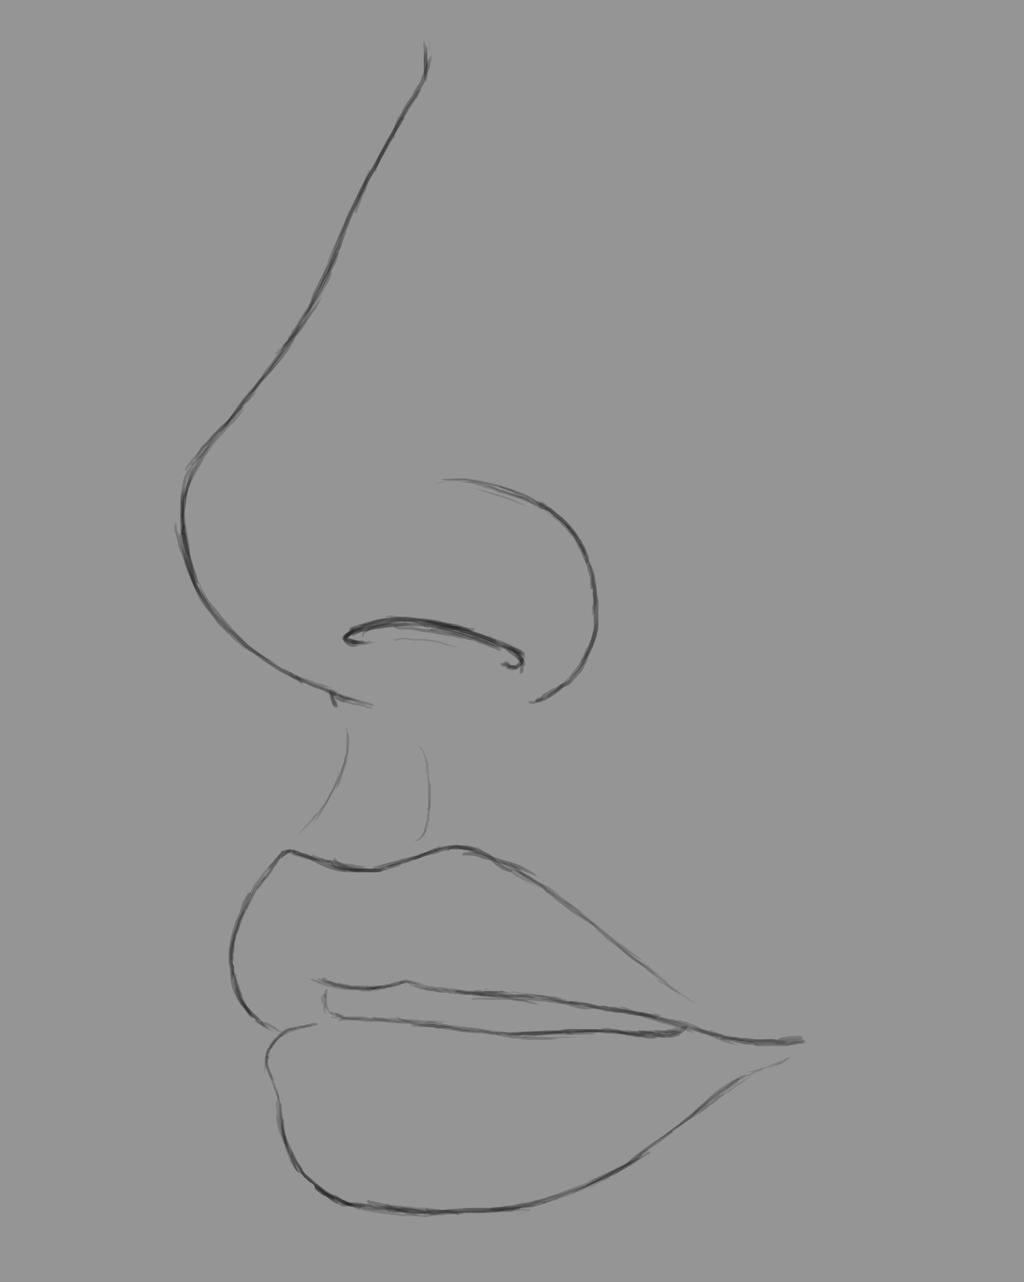 NoseAndMouth Daily sketch #609 by GothicVampireFreak